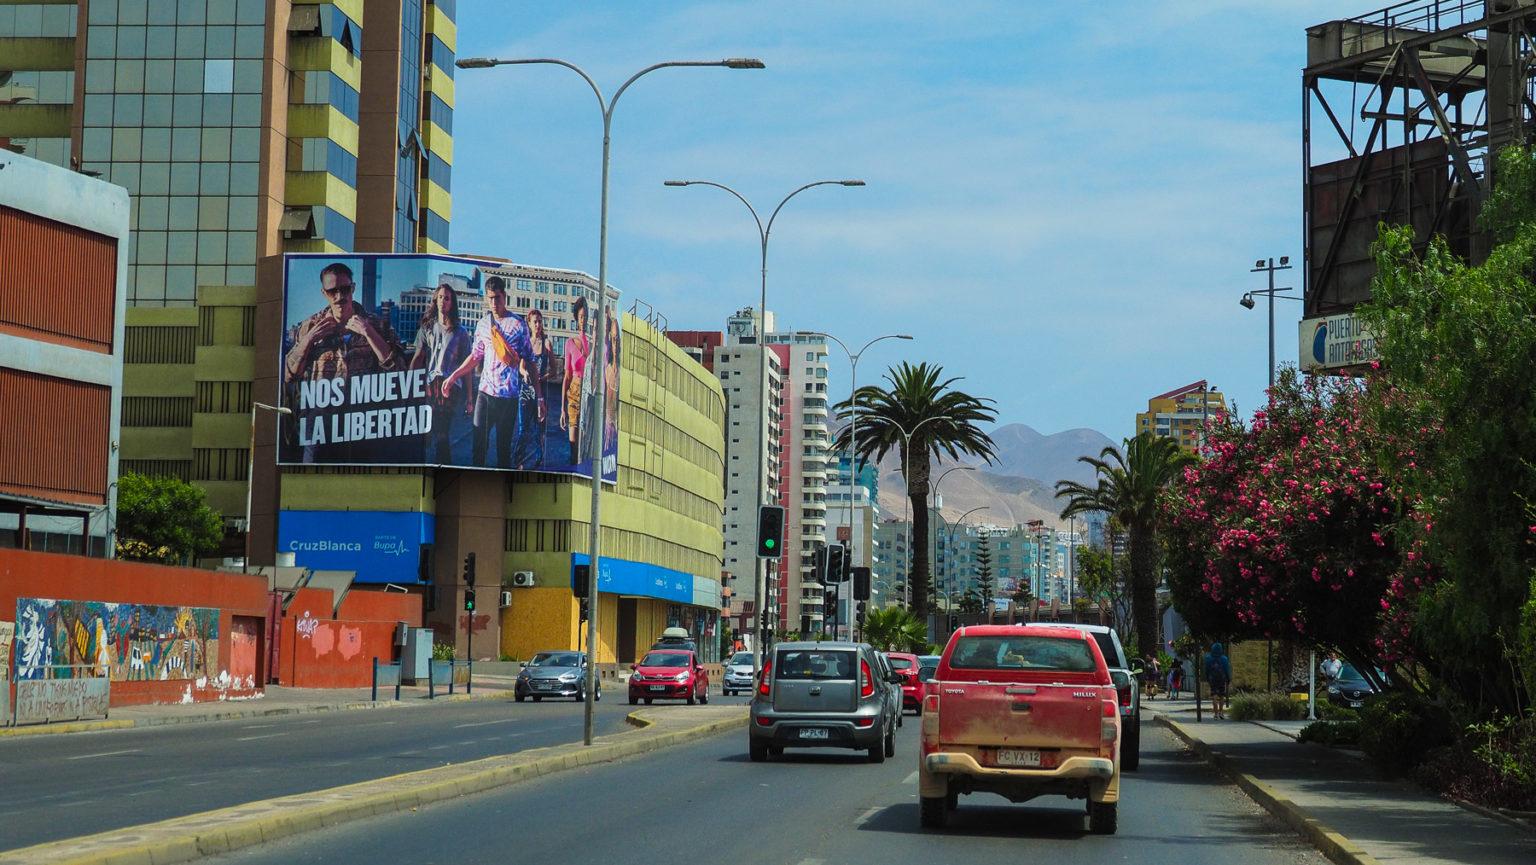 Nos mueve a Libertad – Das Motto der Unruhen in Chile